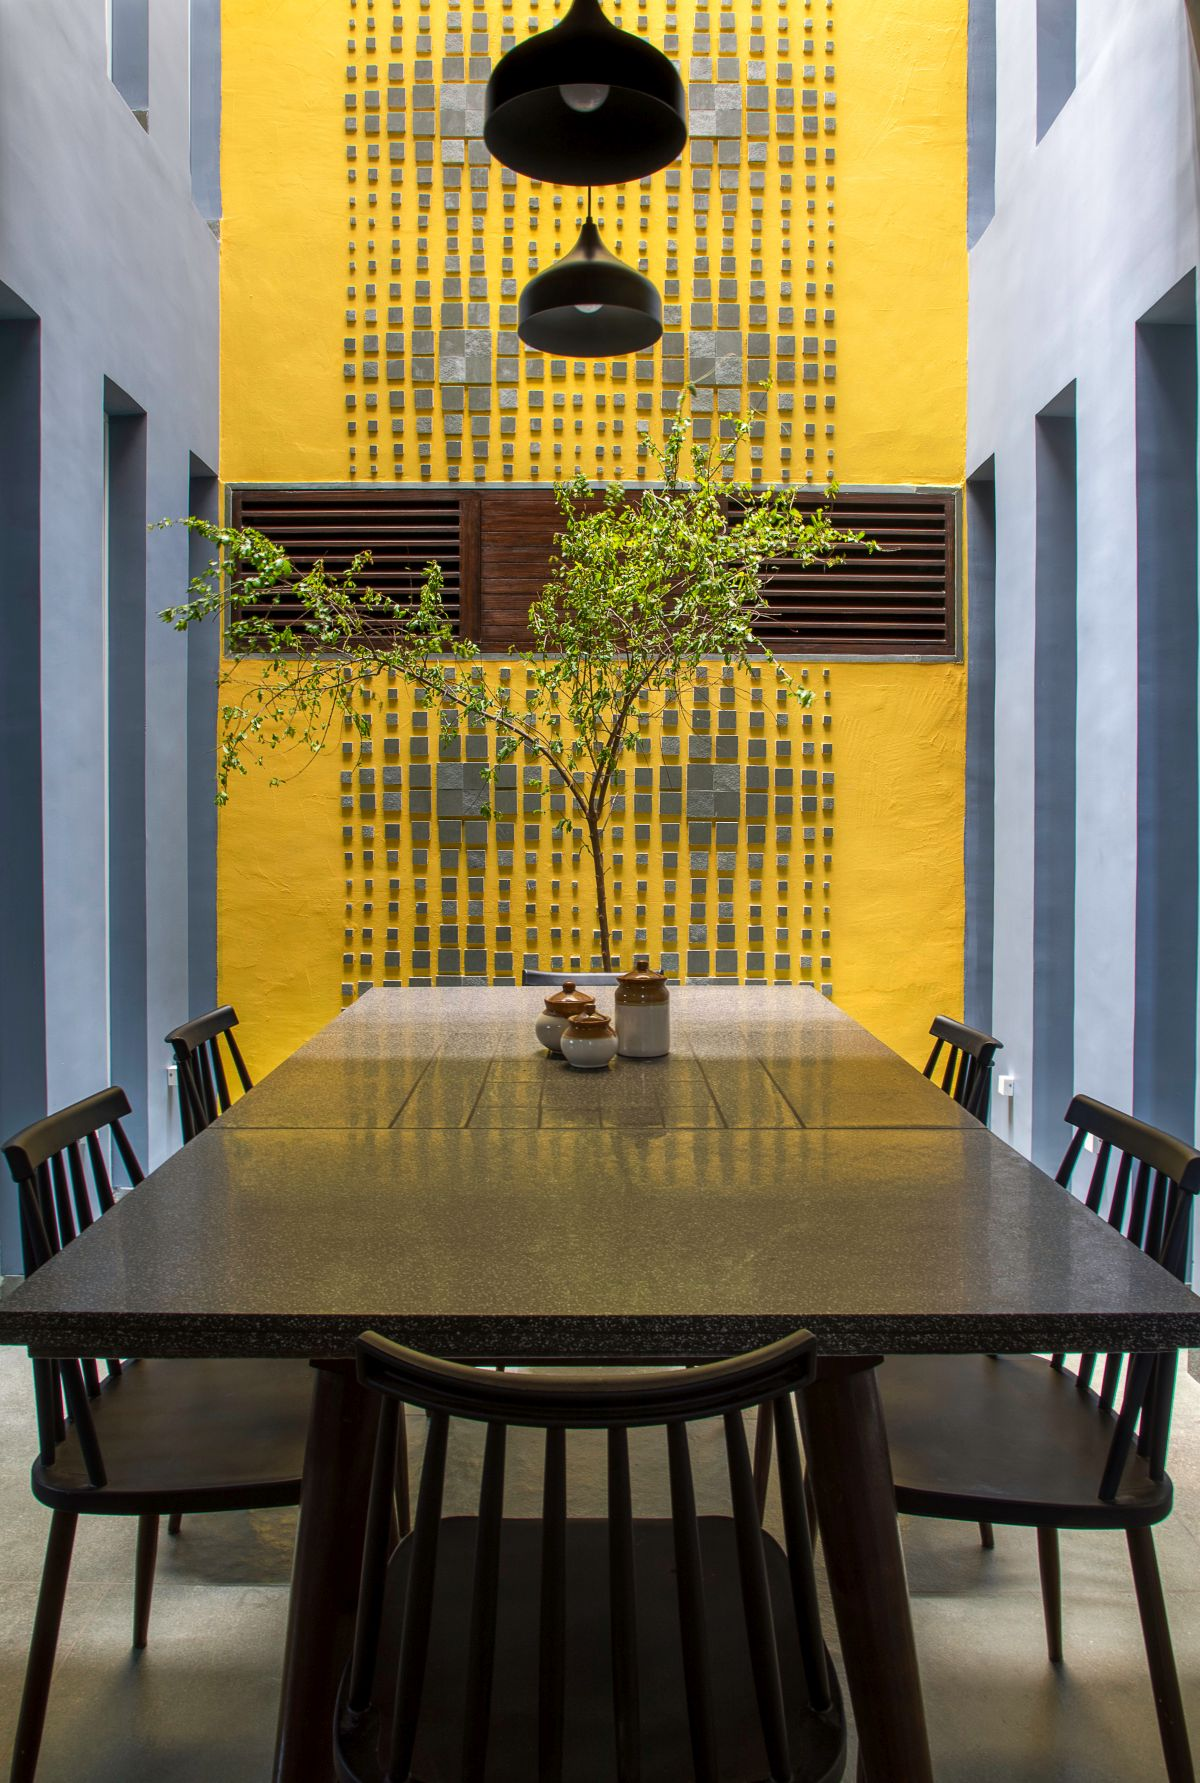 Clay roof tiles façade to minimize heat gain and has decorative function, at Vadodara, by Manoj Patel Design Studio 10